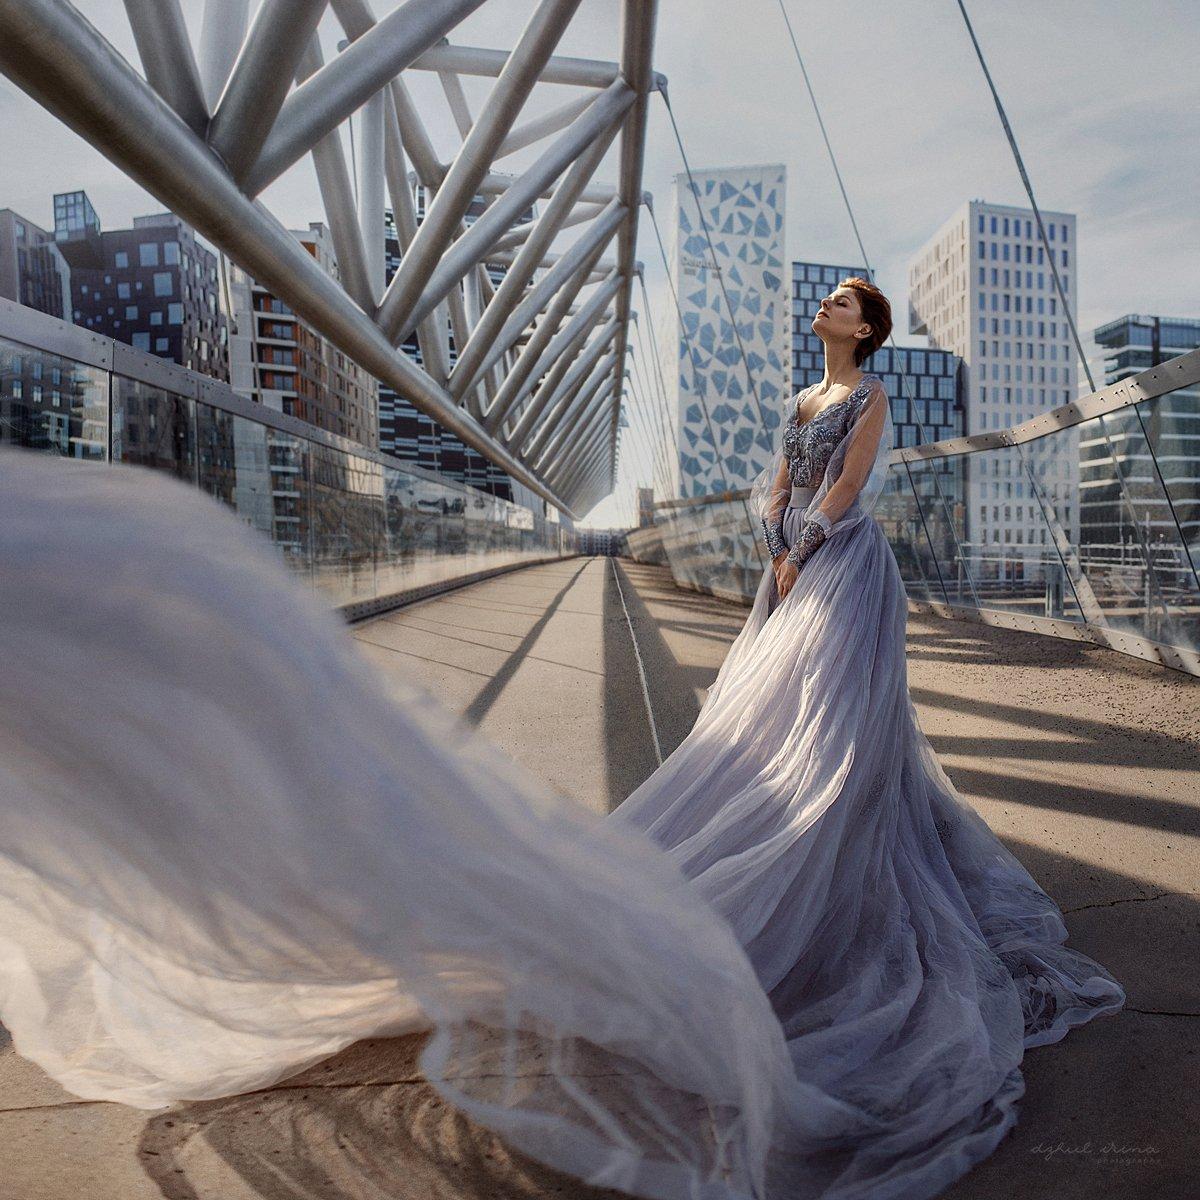 portreite girl people dzhulirina irinadzhul oslo city dress, Ирина Джуль